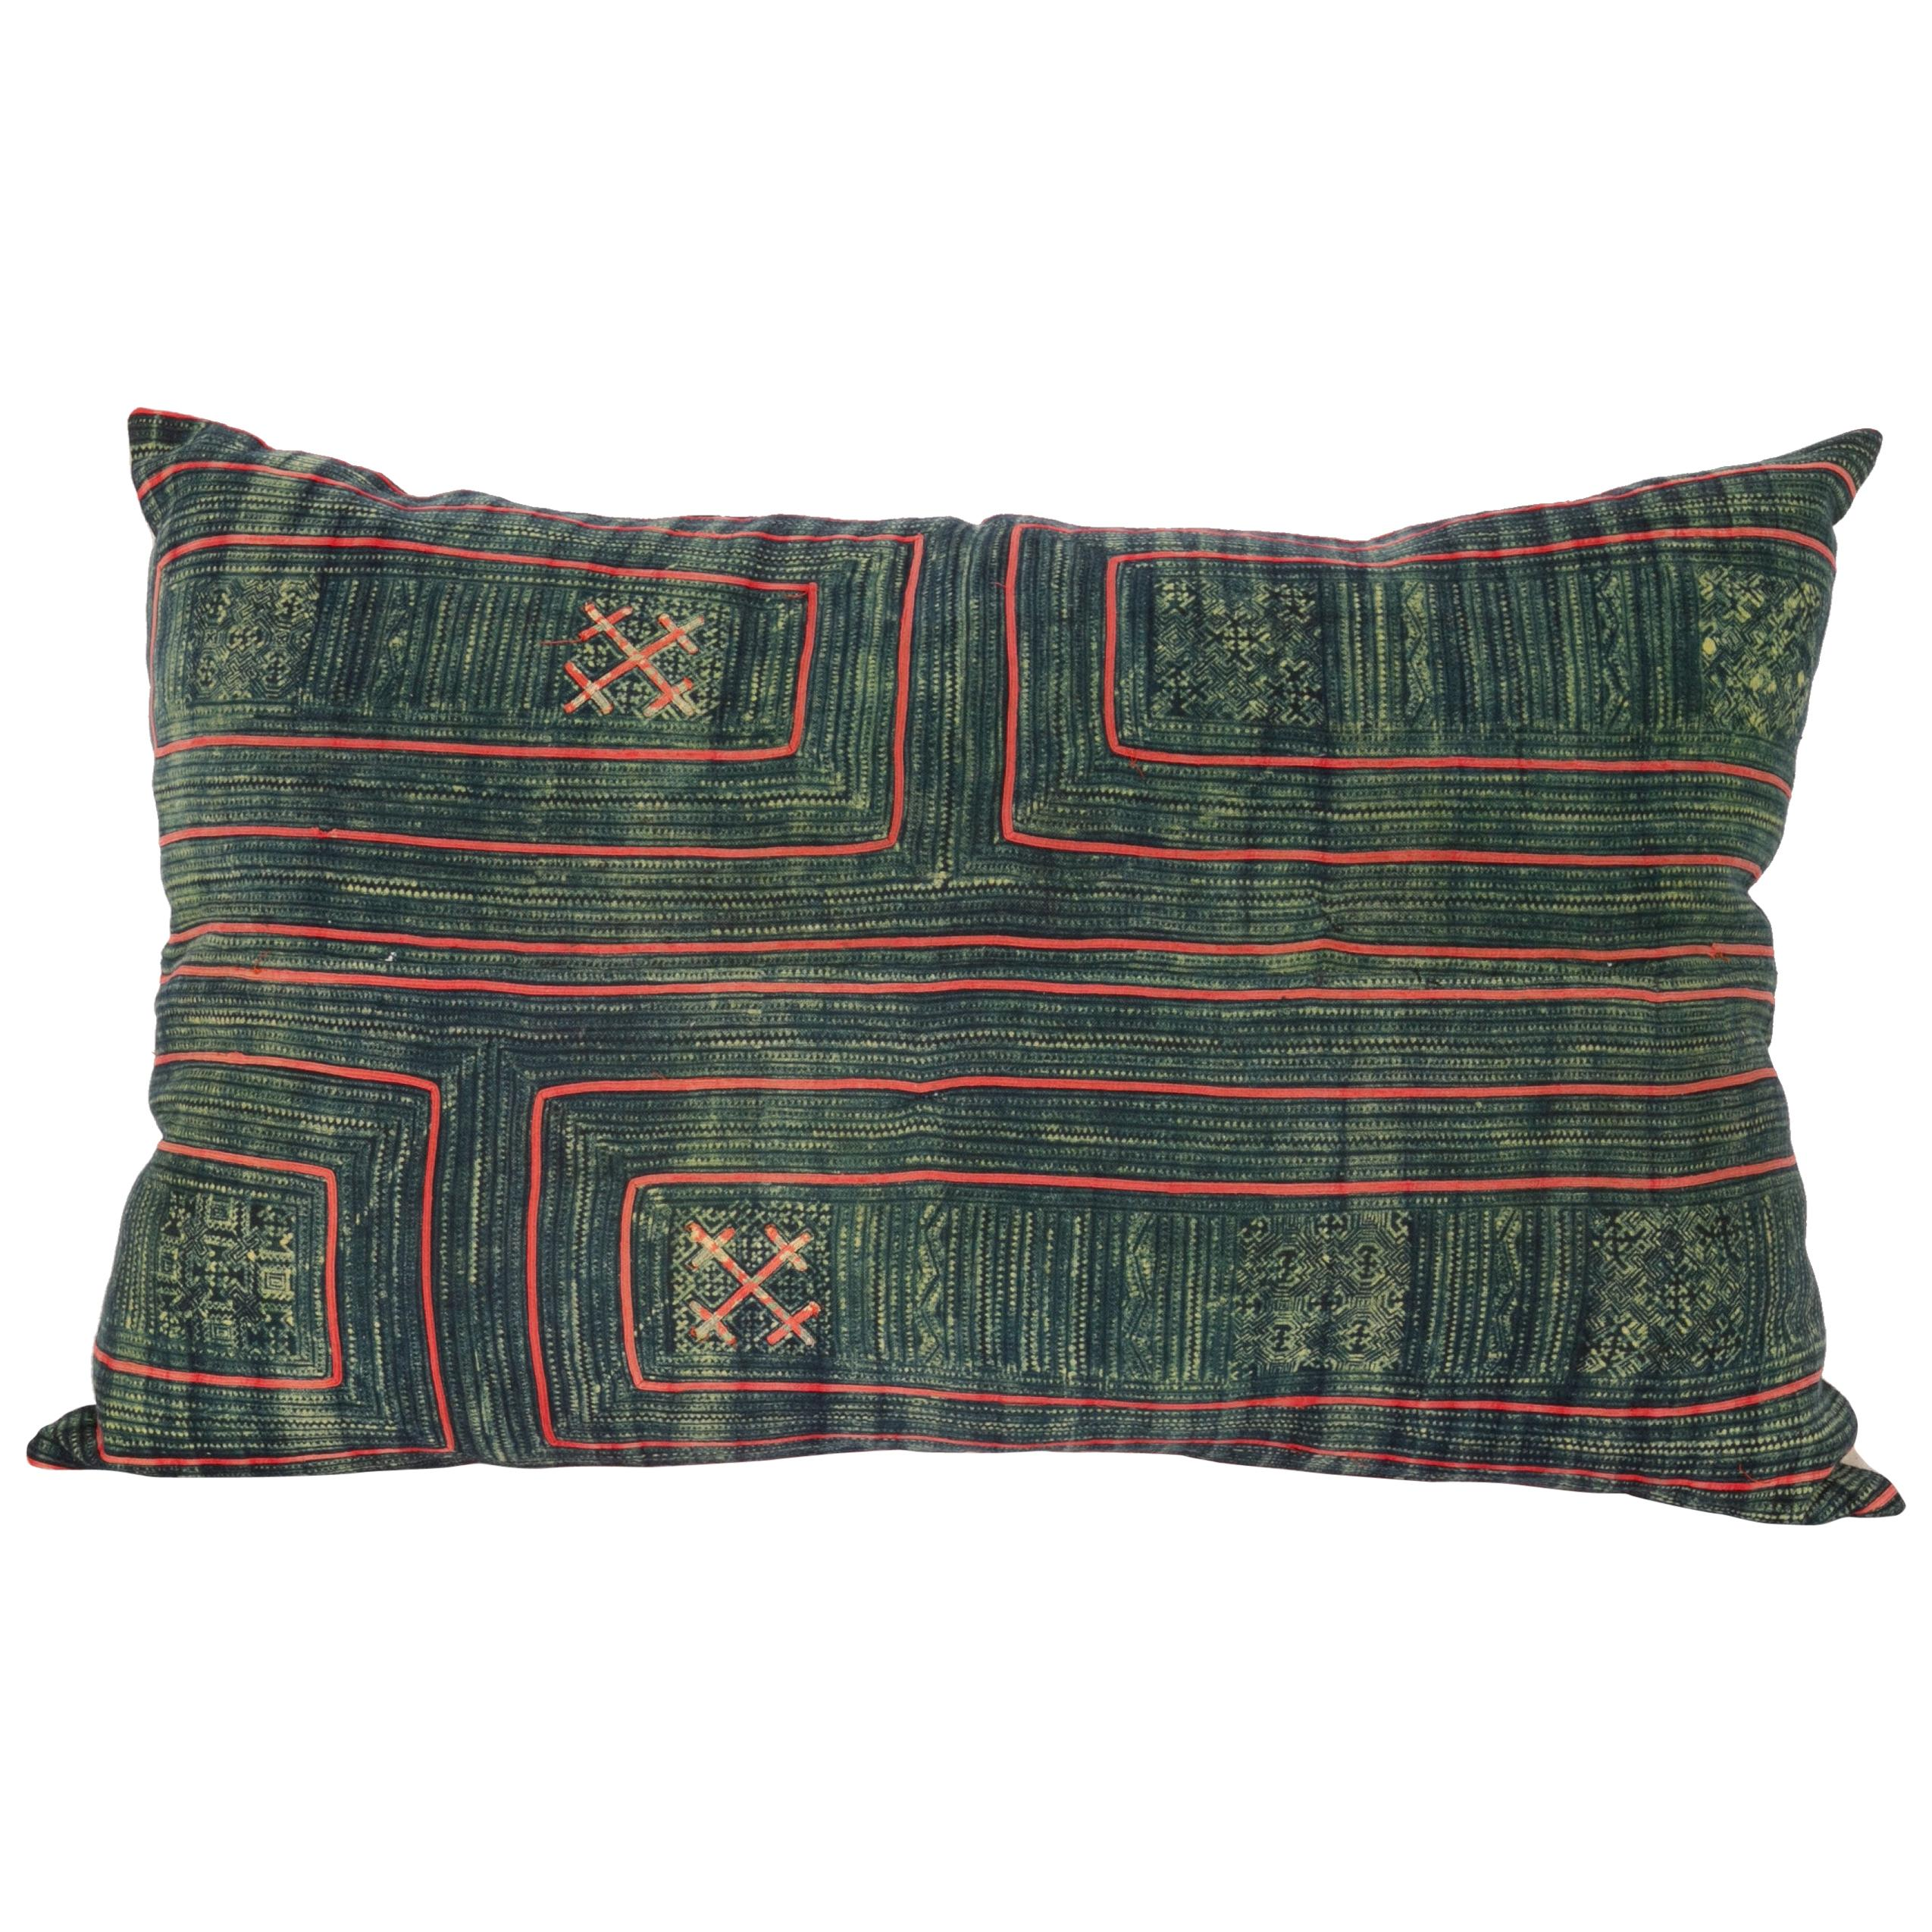 Lumbar Pillow Cases Made from Hmong Hill Tribe Indigo Batik Textile